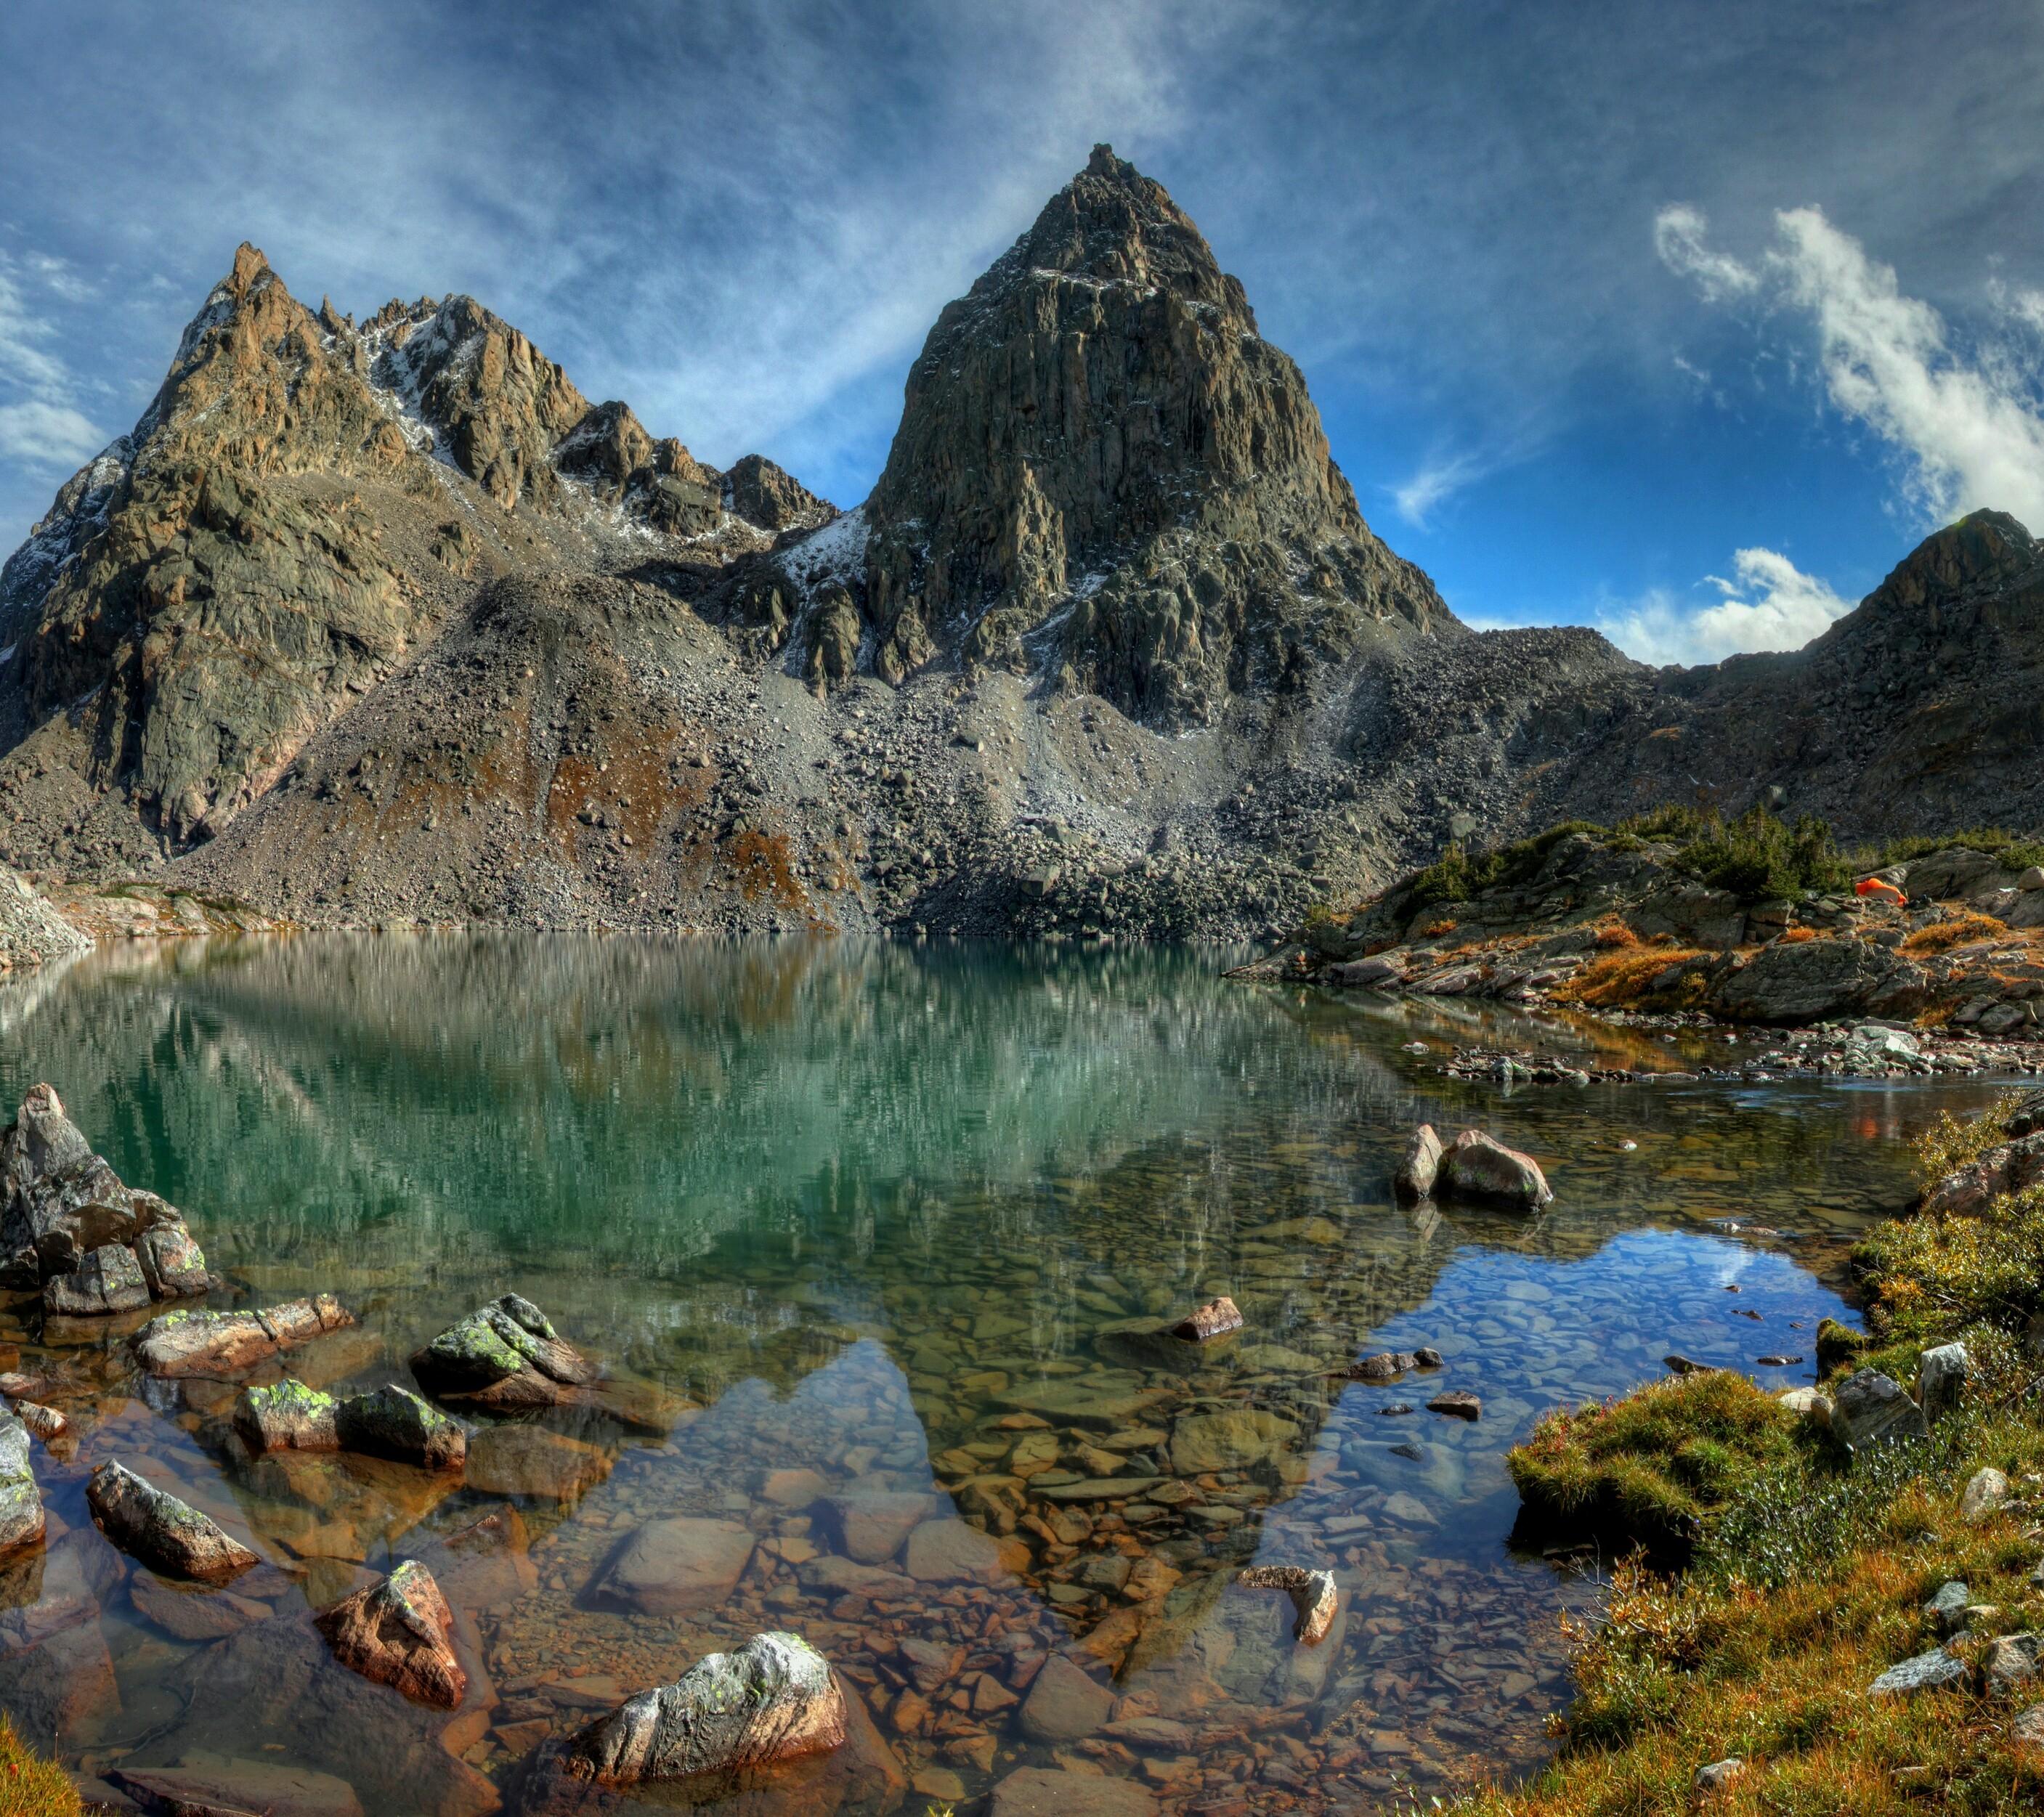 Peak Lake Wind River Mountains Wy Oc X